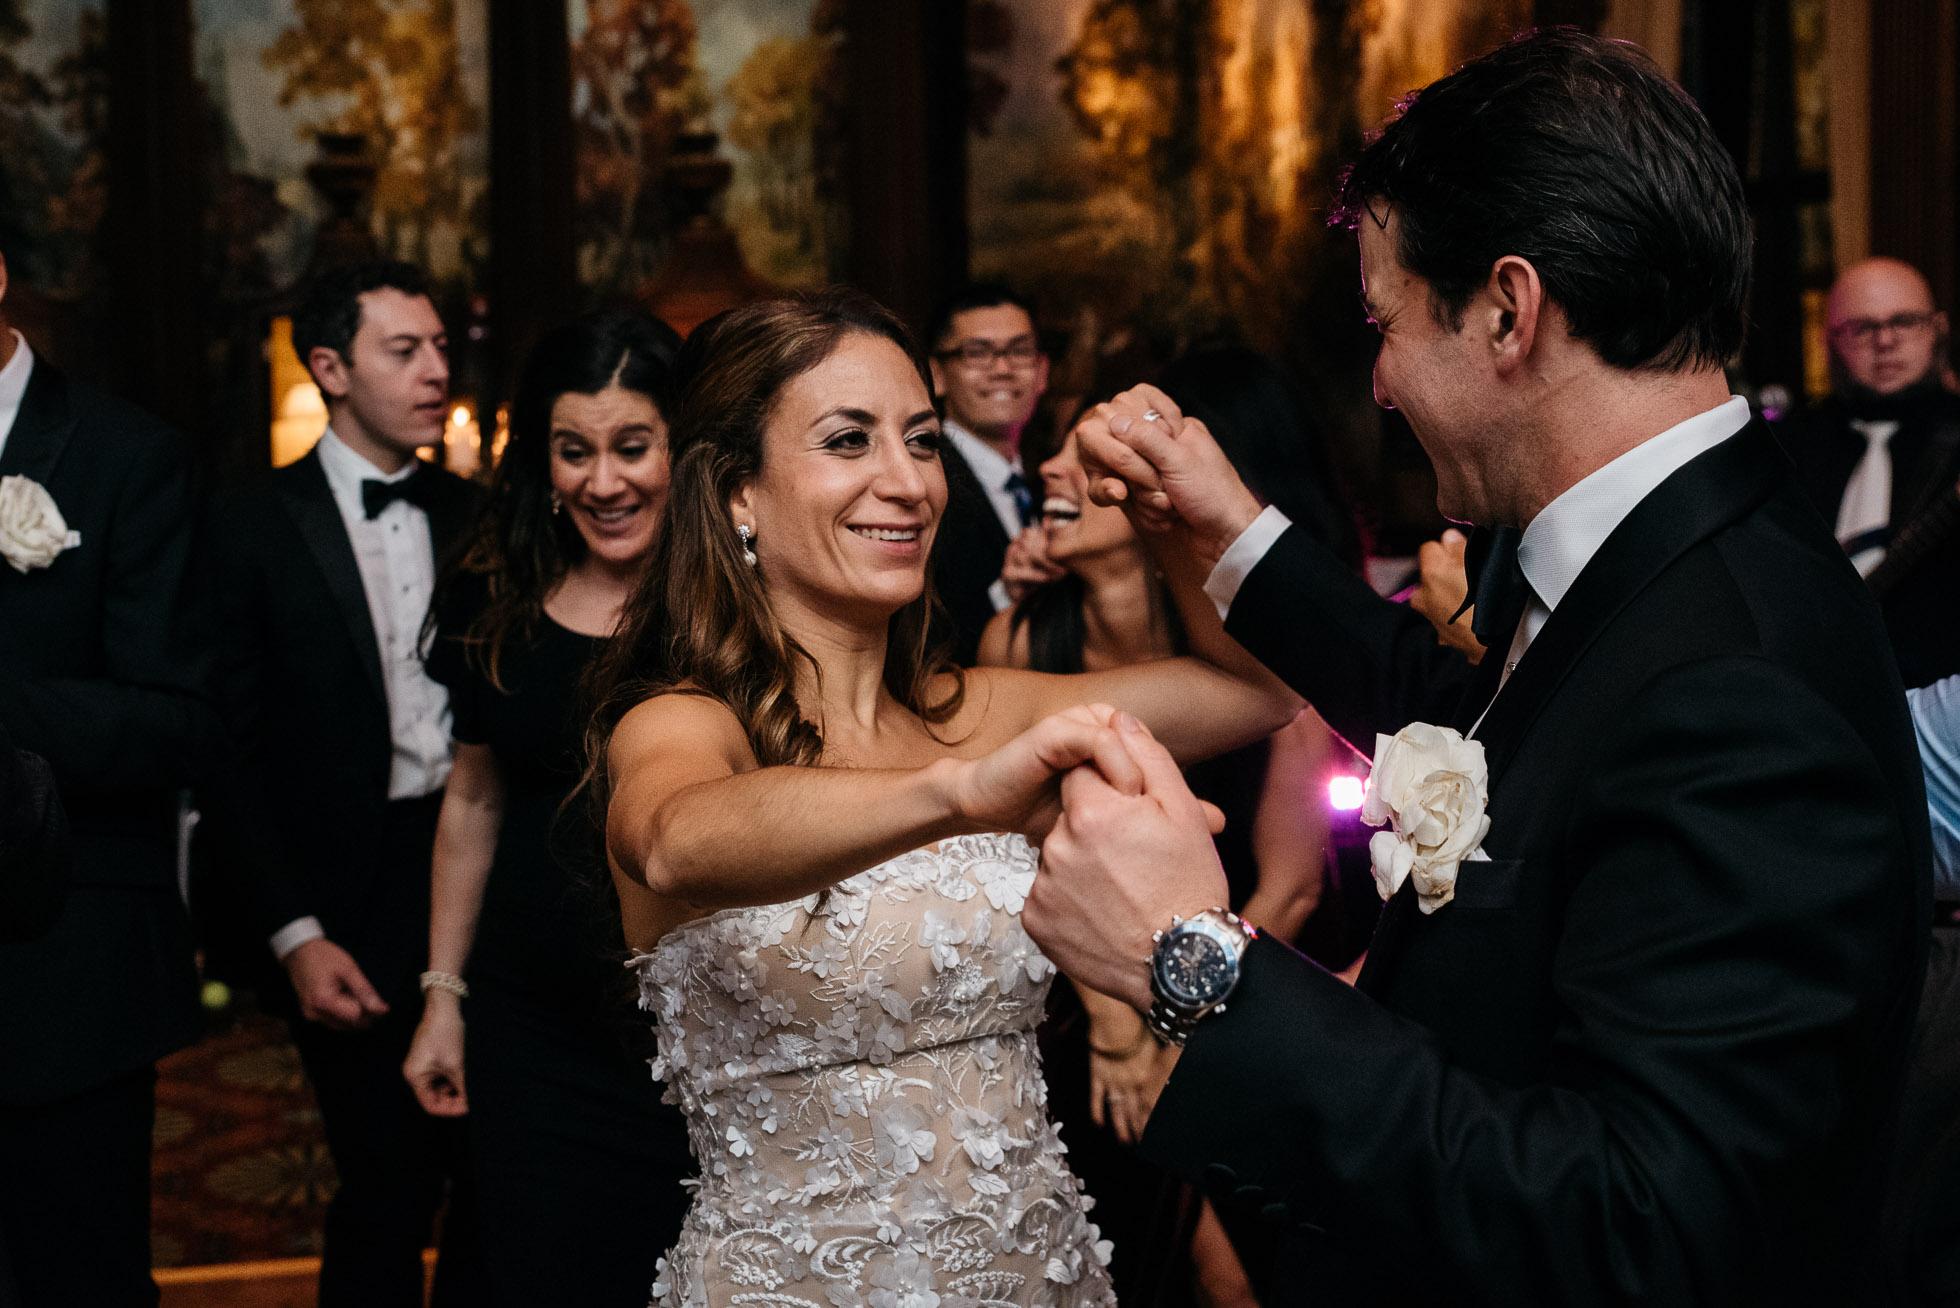 Duquesne Club Pittsburgh PA, Mariah Fisher, reception dancing, party-2.jpg